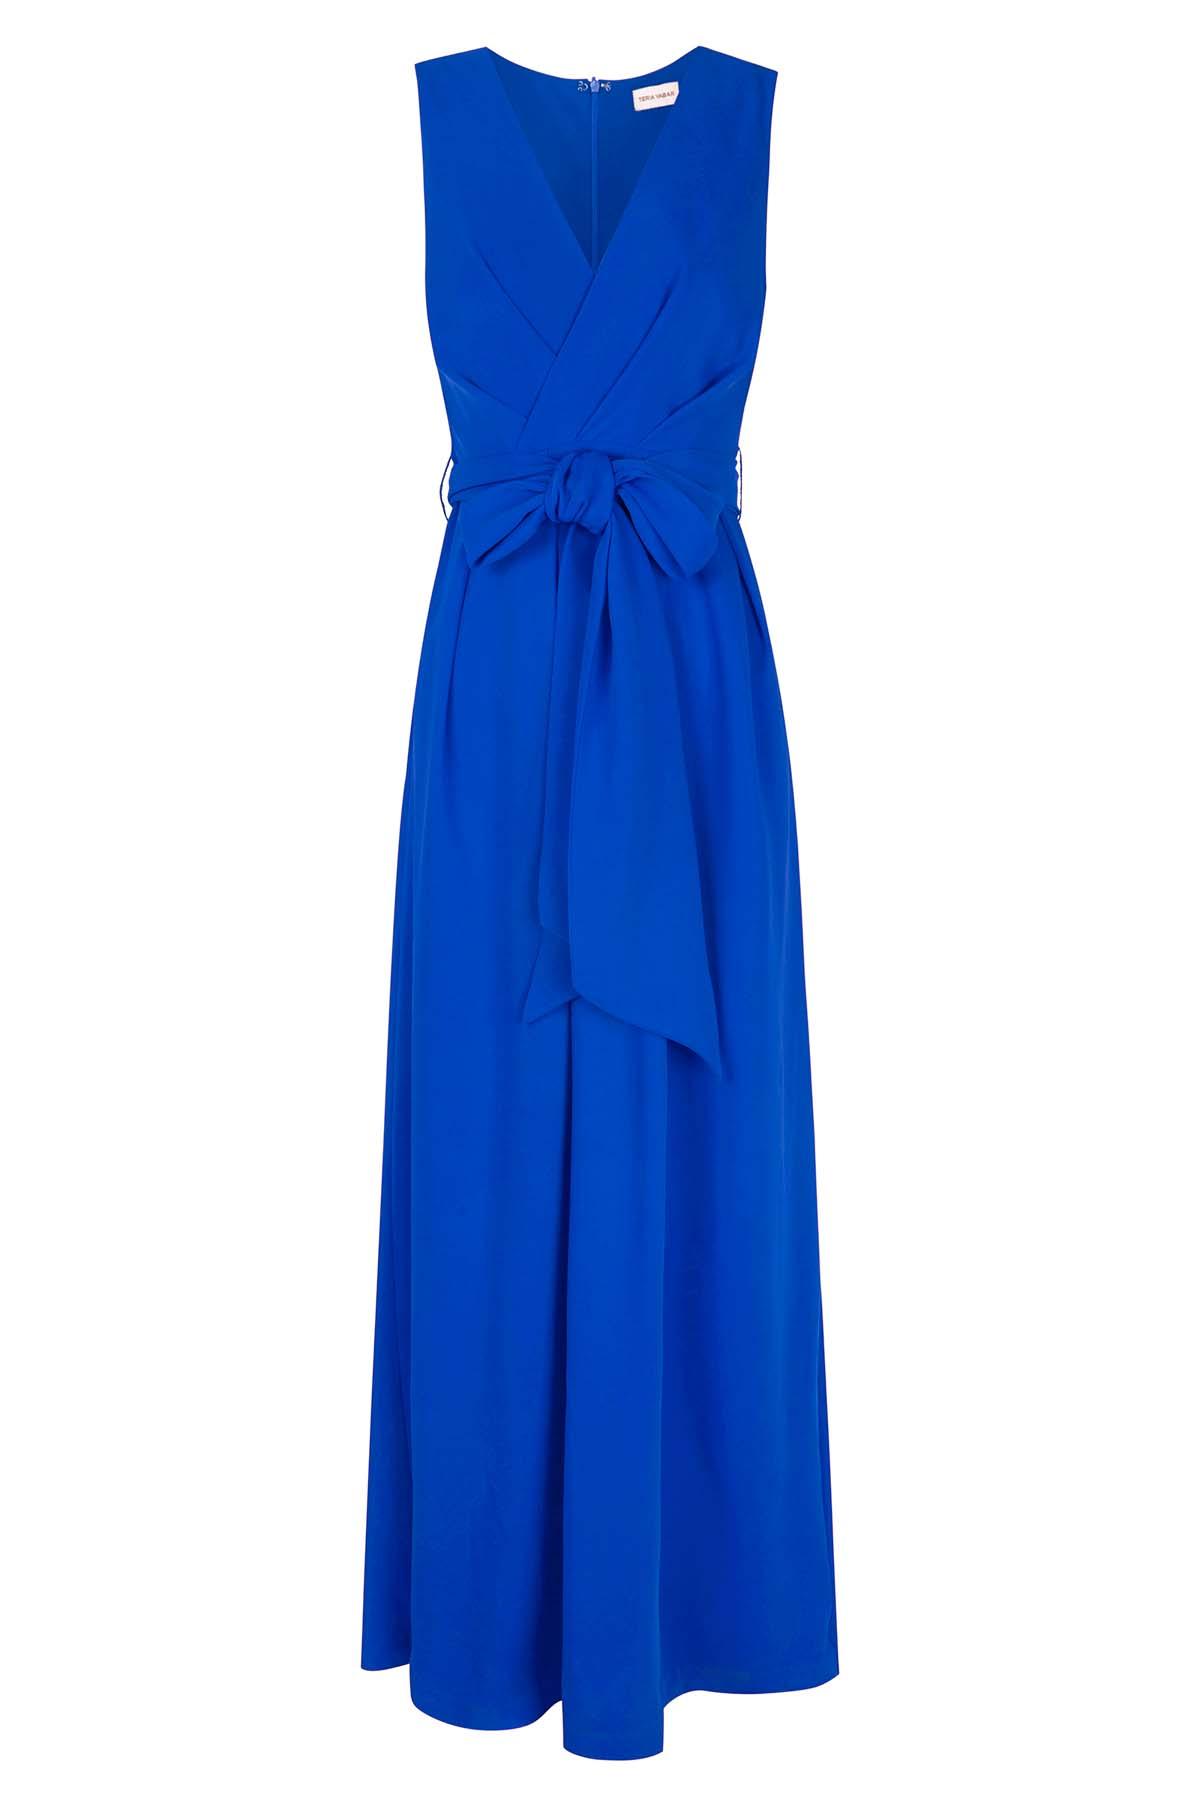 Teria Yabar - Vestido azul Saint Germain